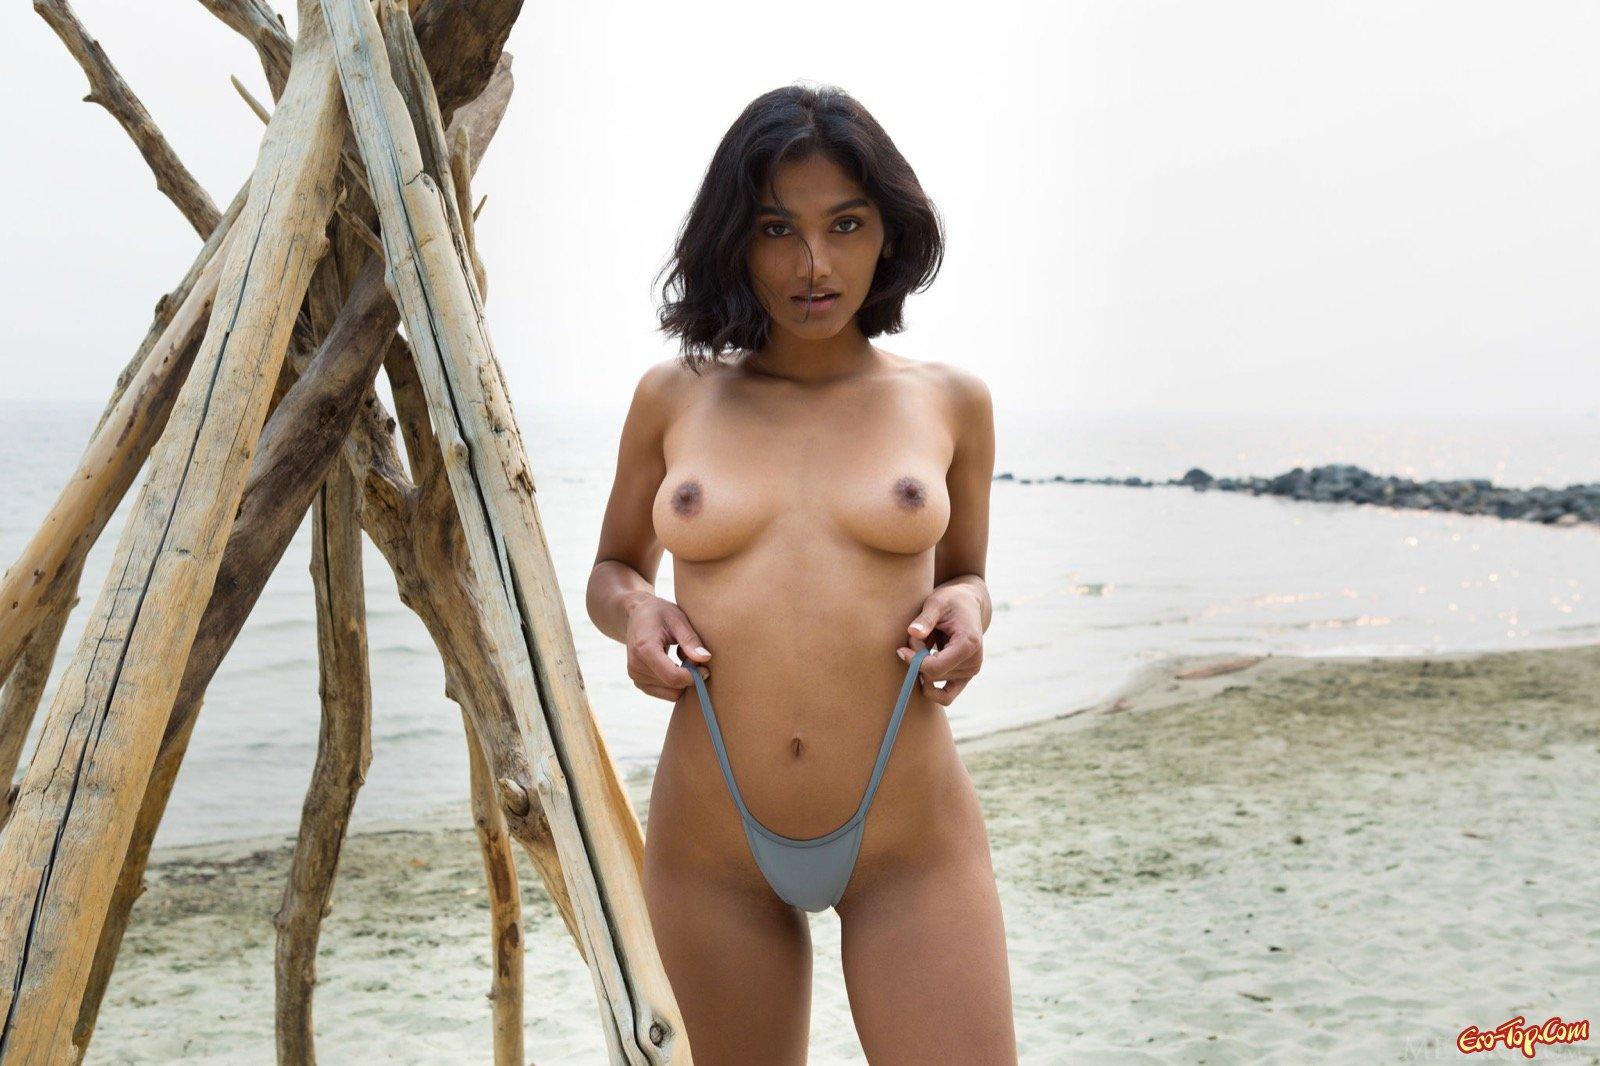 Экзотичная девка с лохматой киской на песке